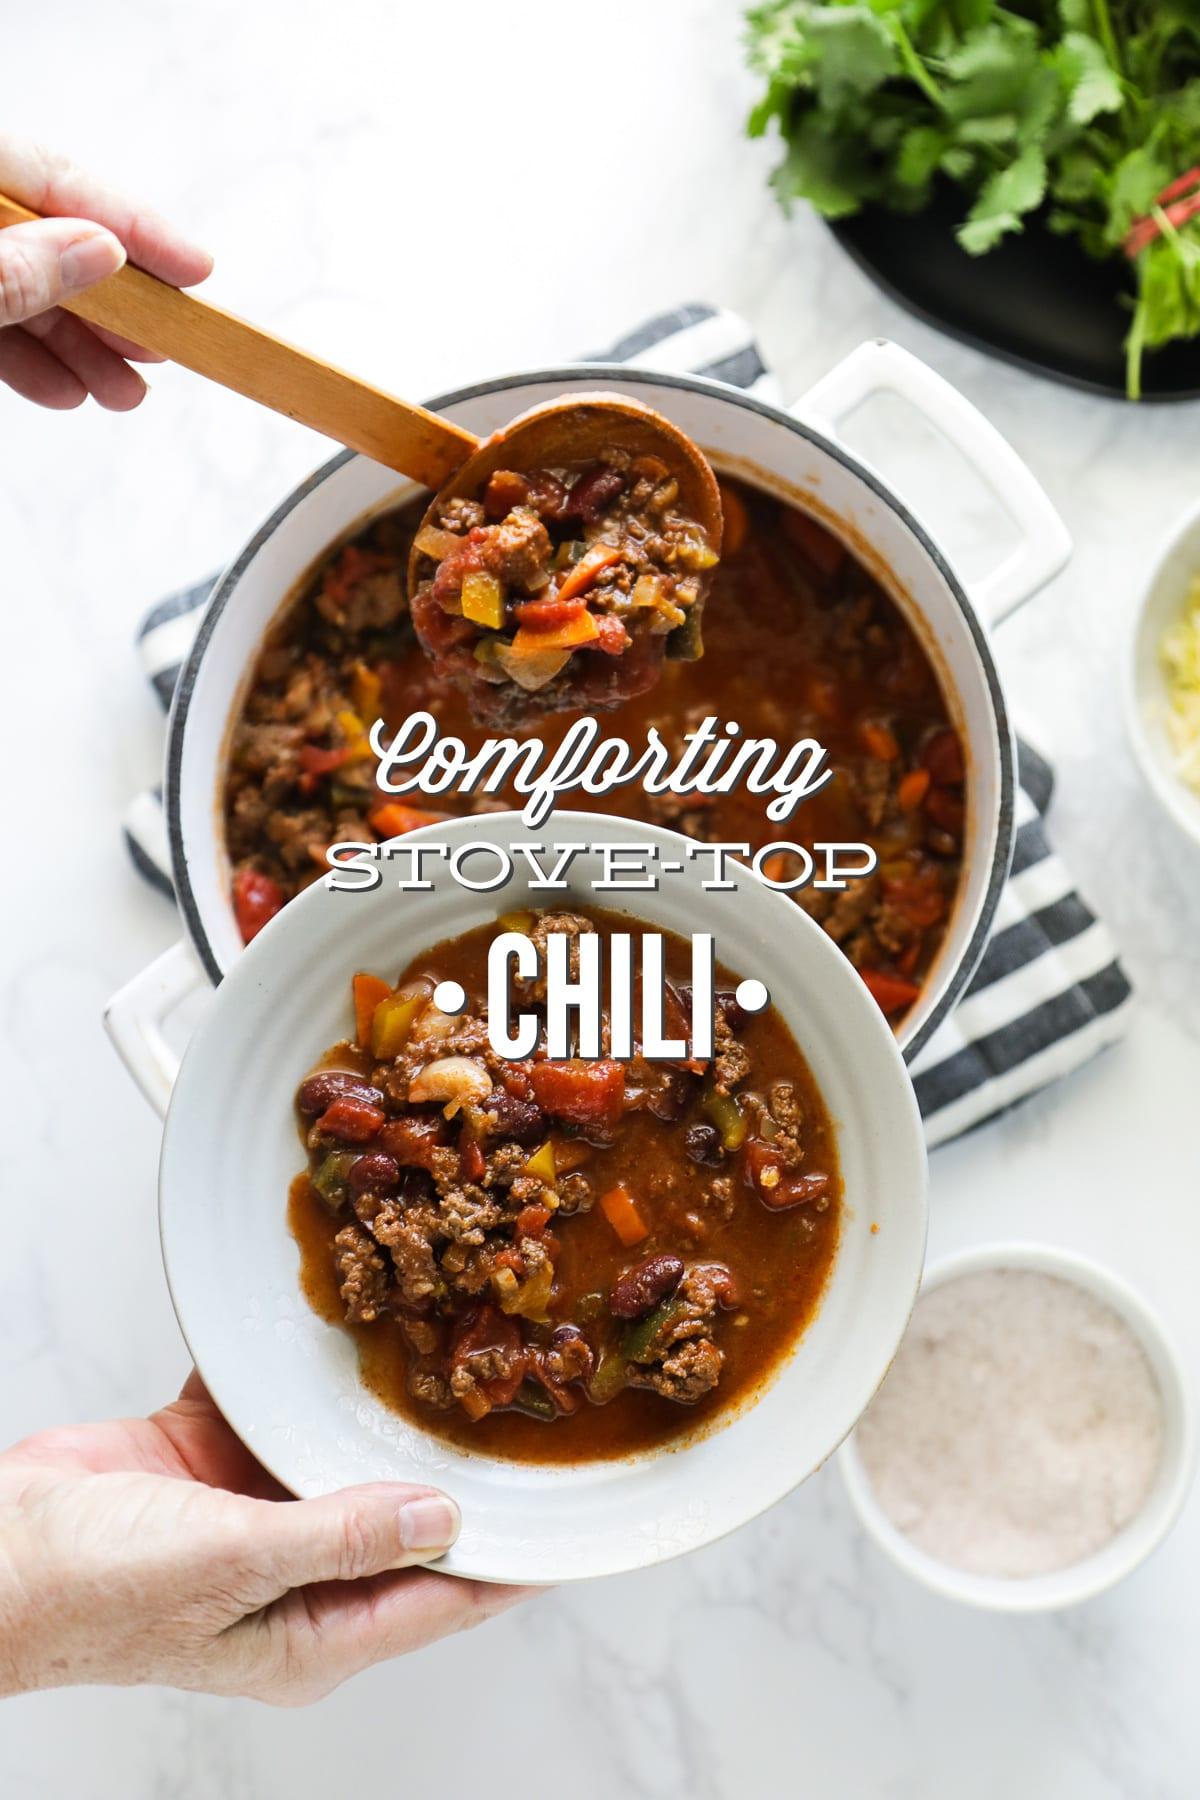 Comforting Stove-Top Chili